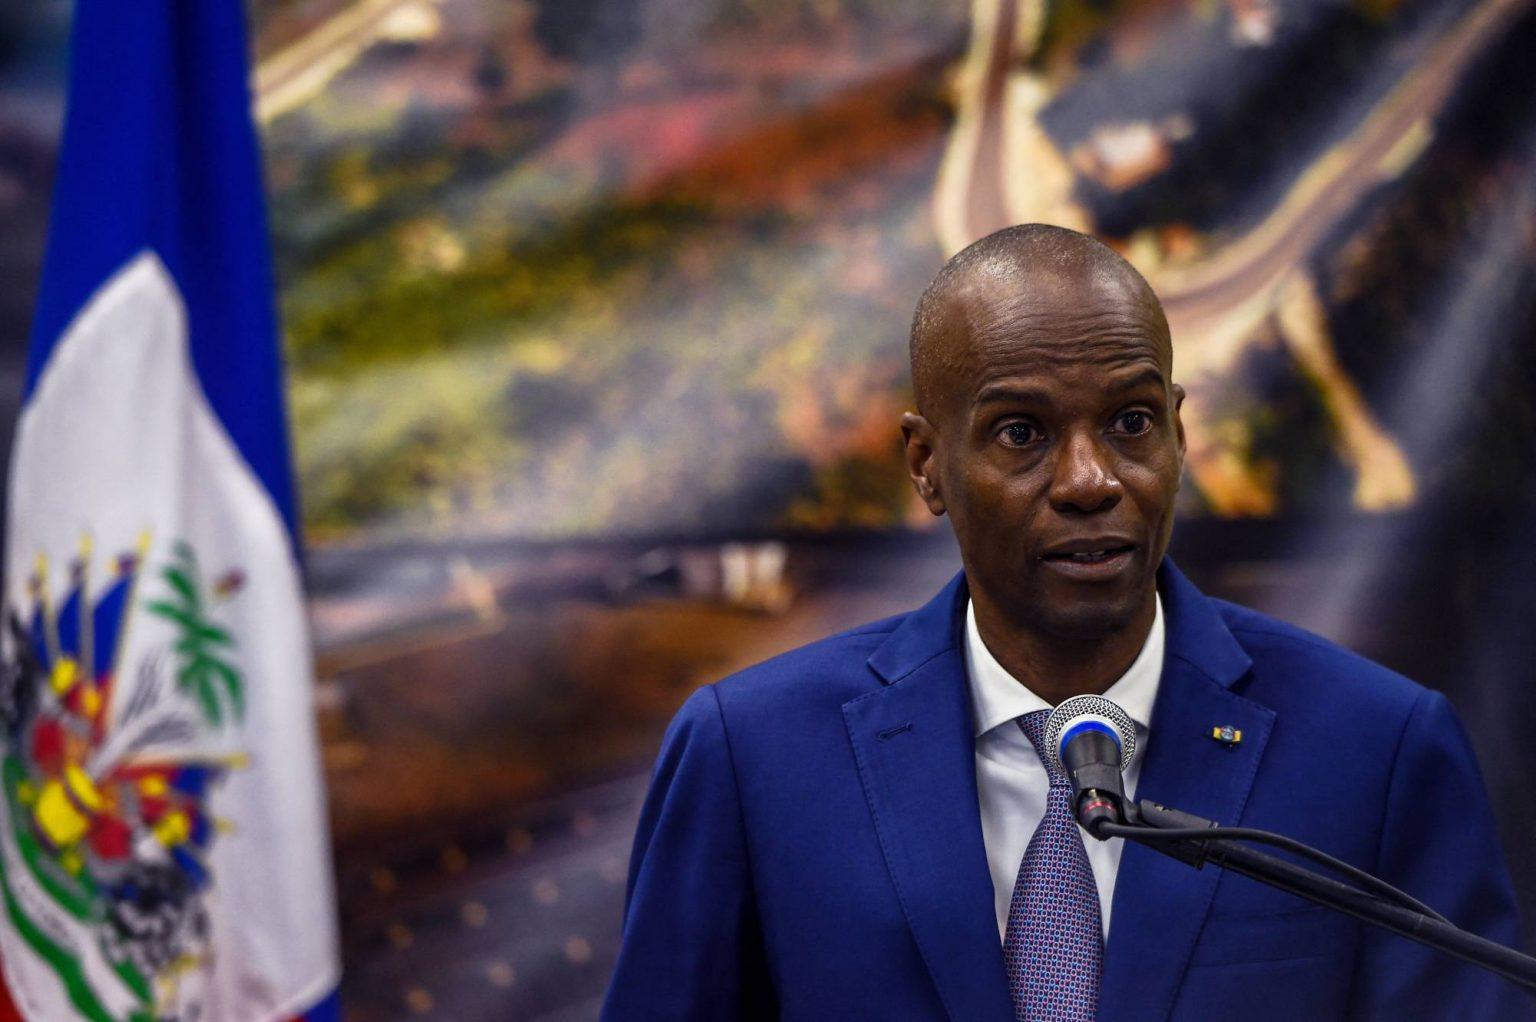 Haiti's President Jovenel Moise Assassinated - Taarifa News